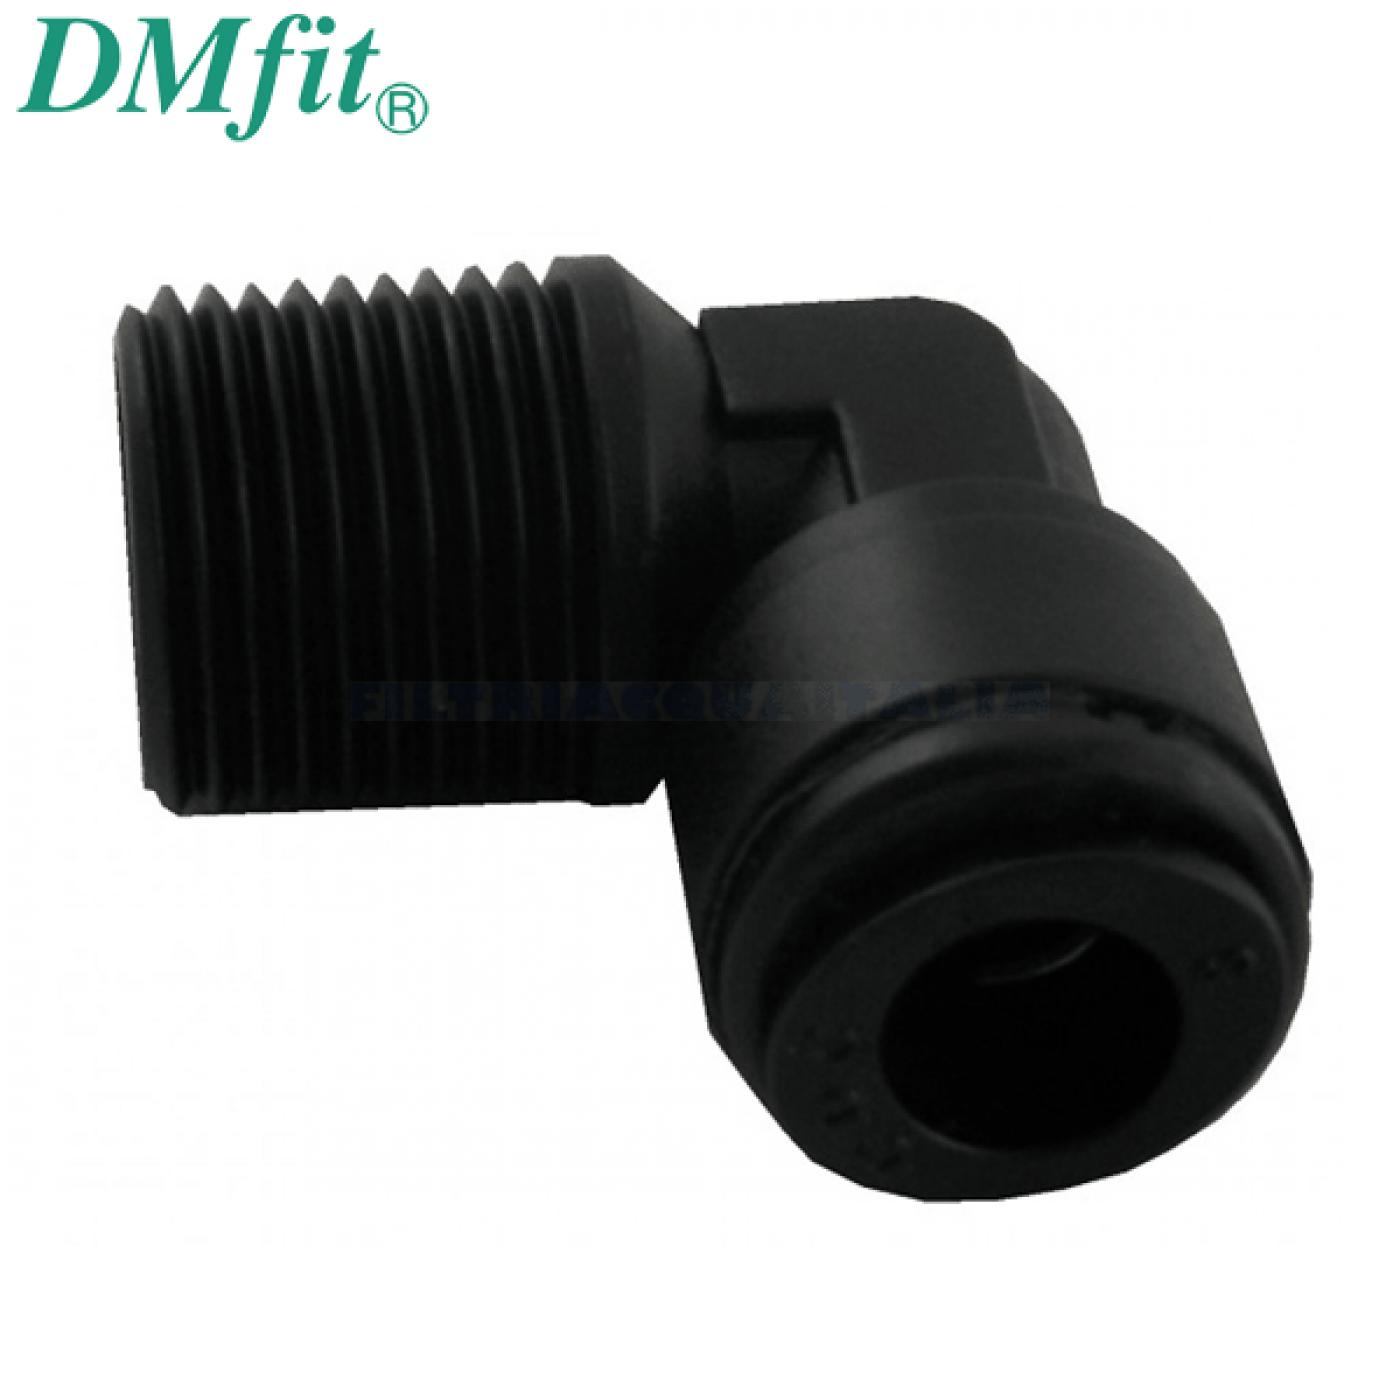 "GOMITO FILETTATO 3/8"" x 8 mm Tubo DMFIT AME0806M"